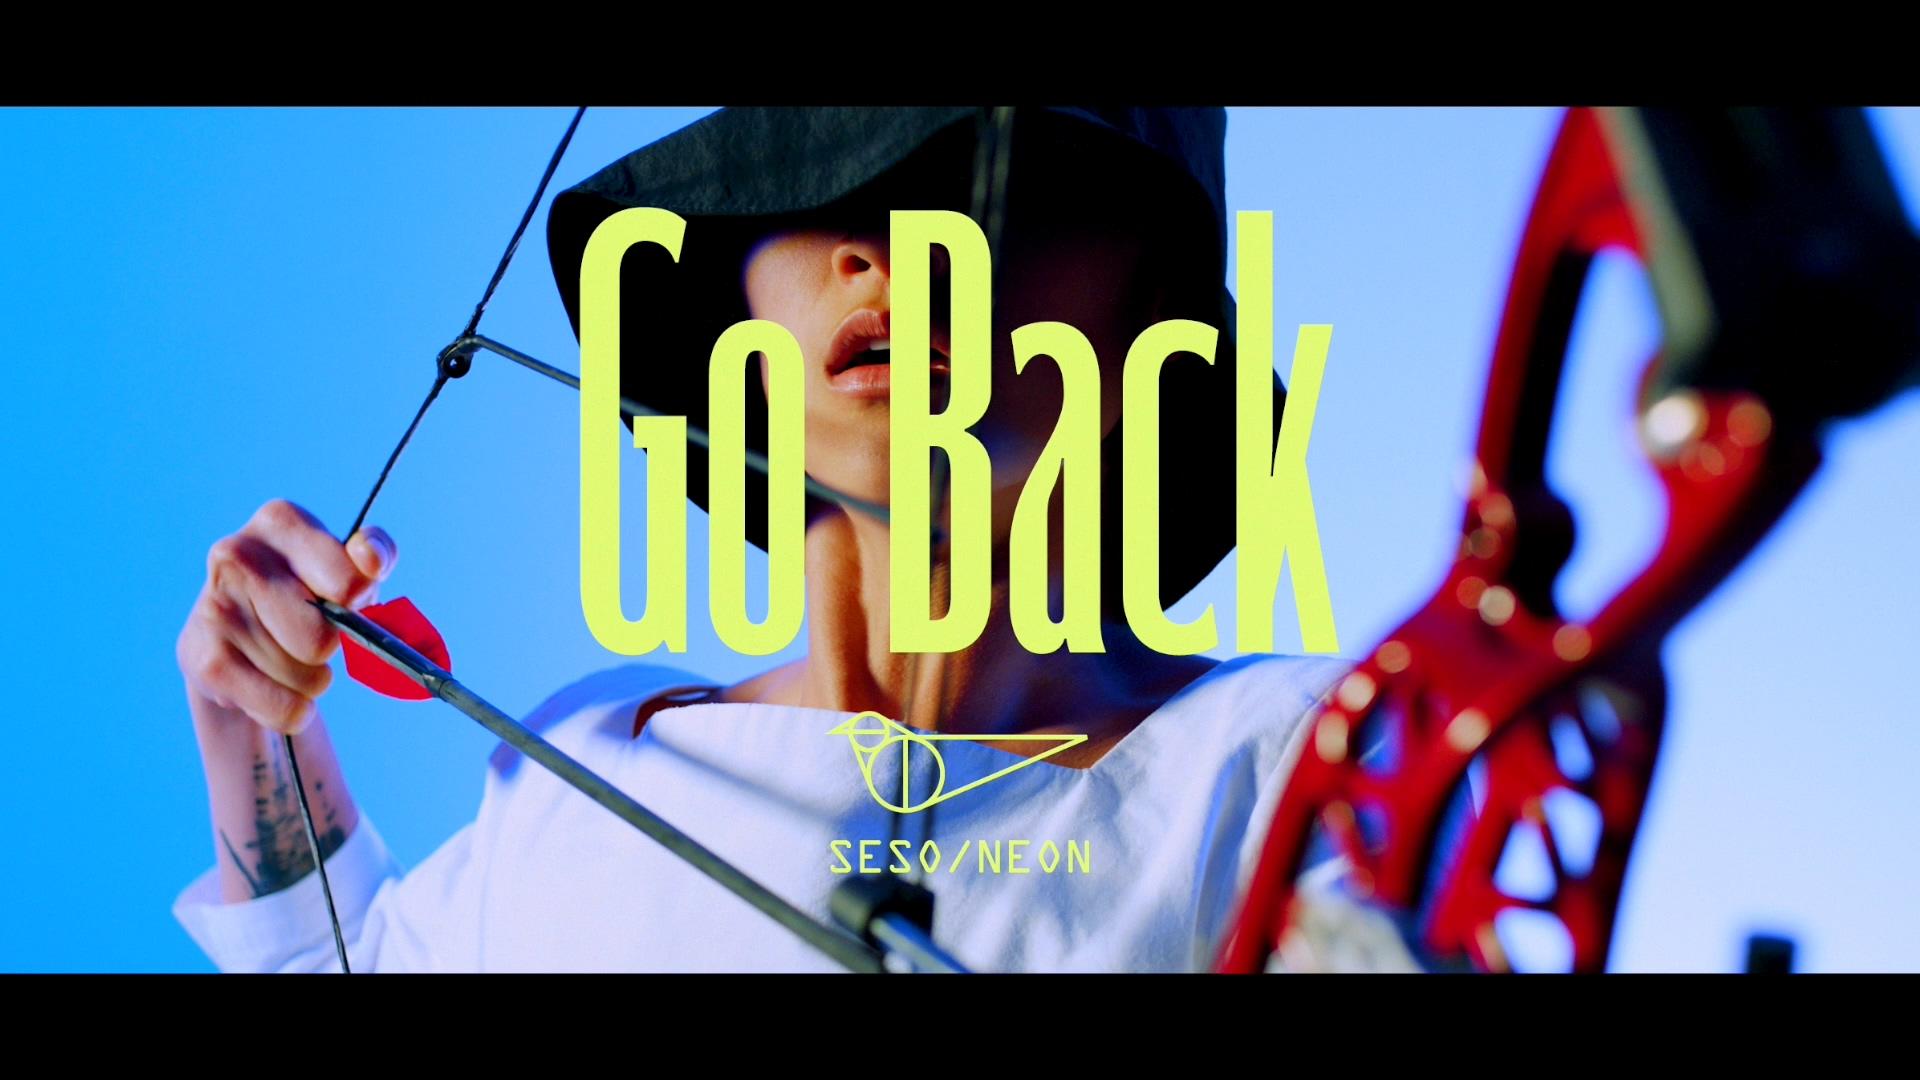 [M/V] 새소년(SE SO NEON) - 집에(go back)